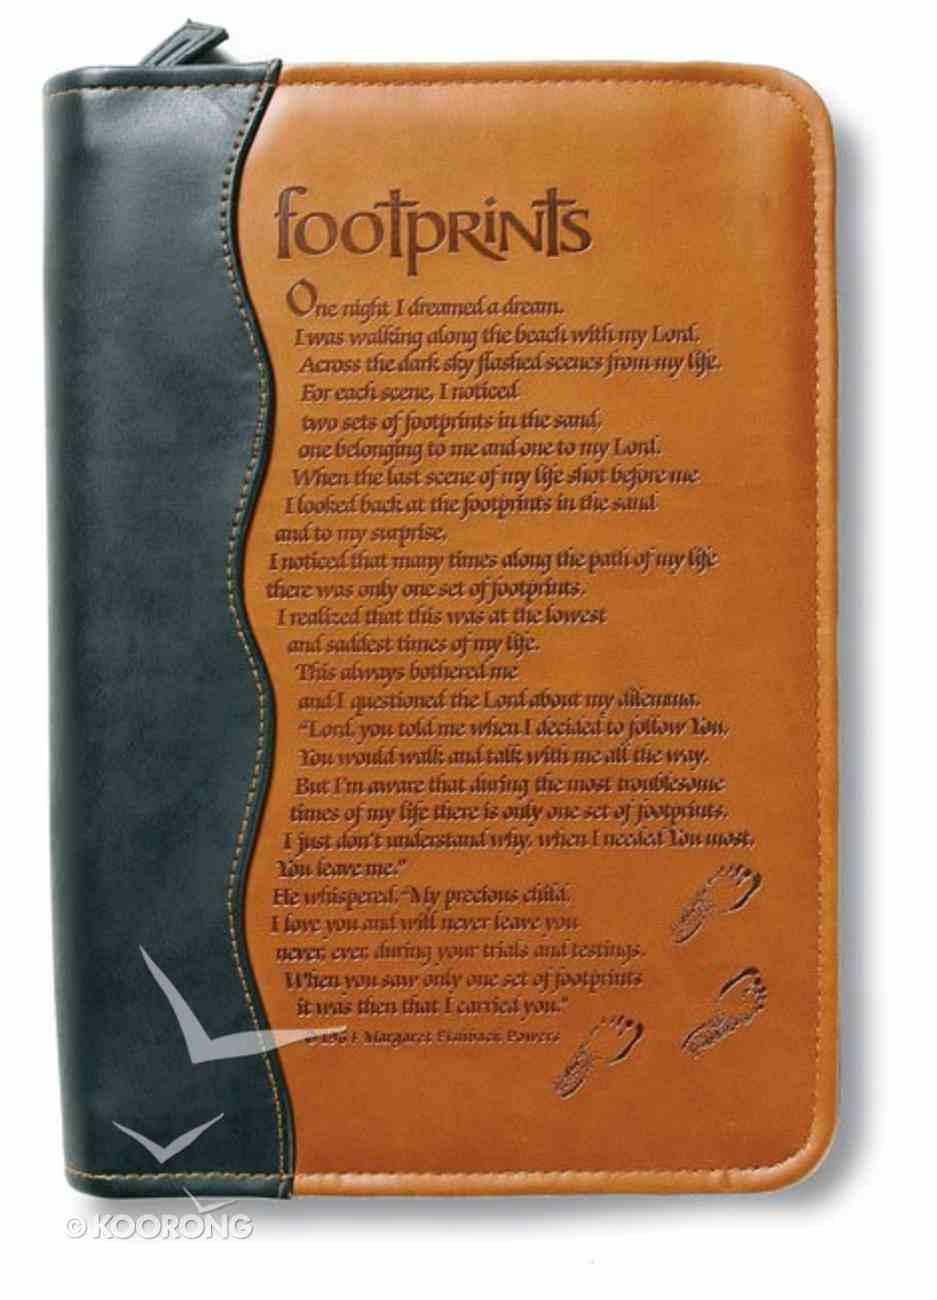 Bible Cover Footprints Duo-Tone Black/Tan Large Bible Cover